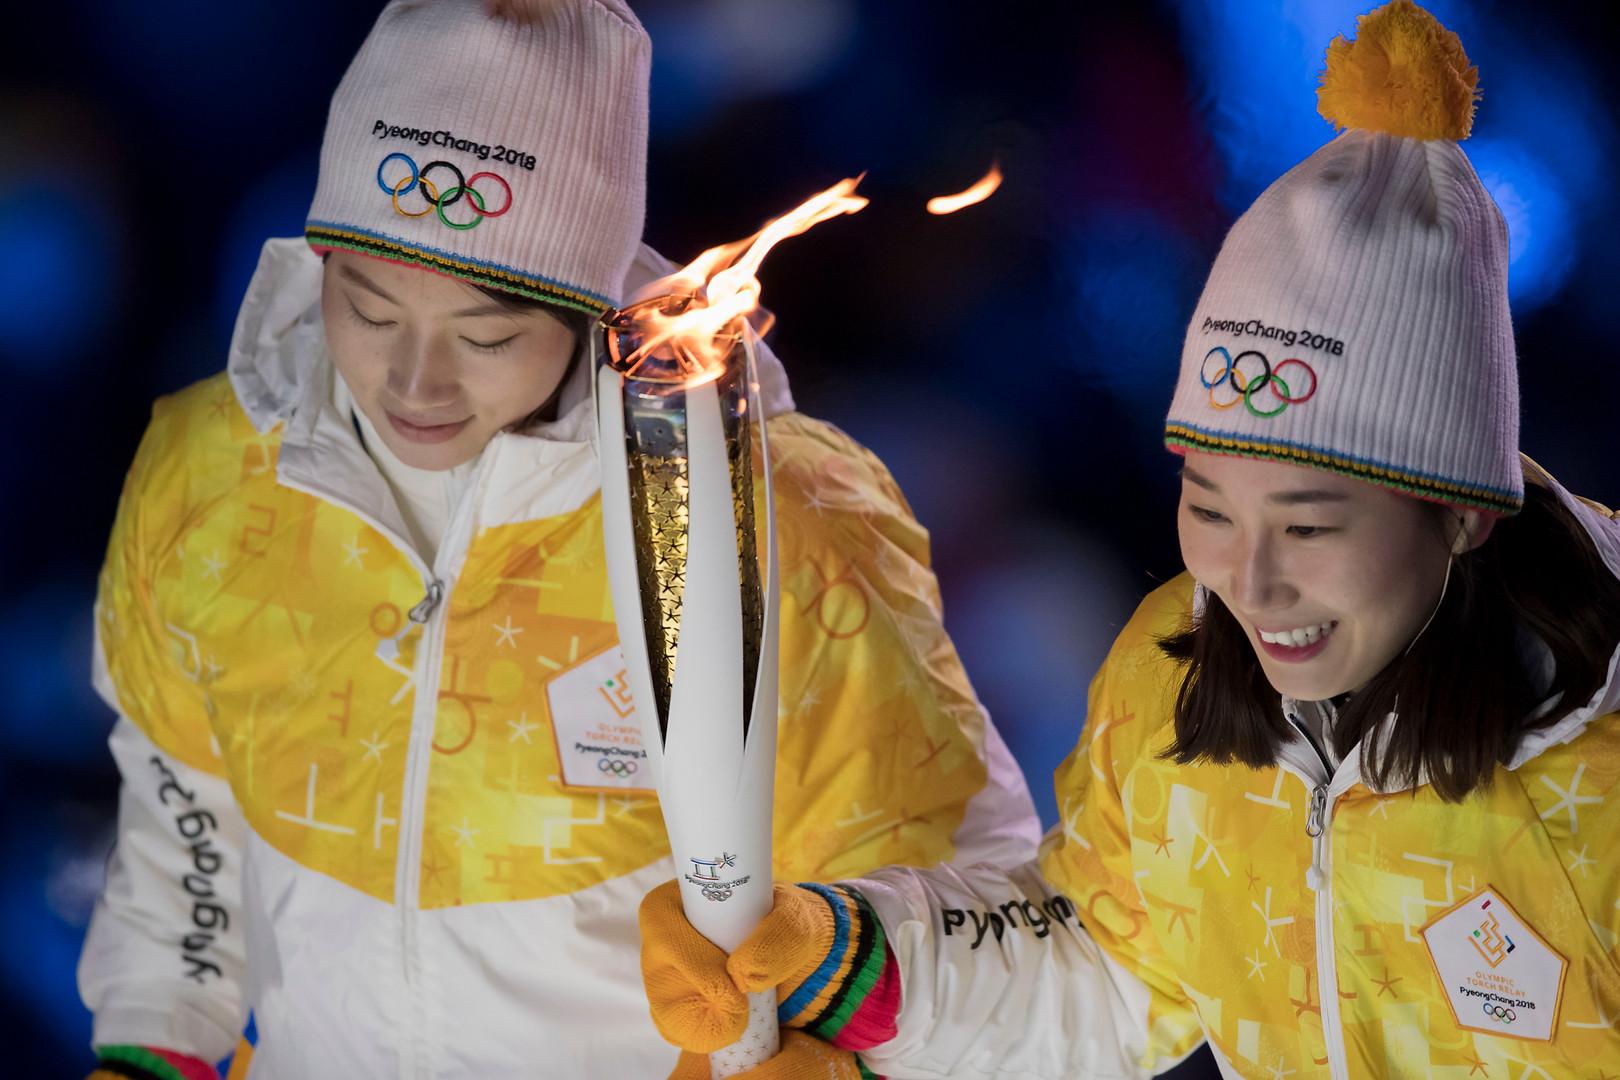 Copy of 20180209_PyeongChang2018_031.jpg